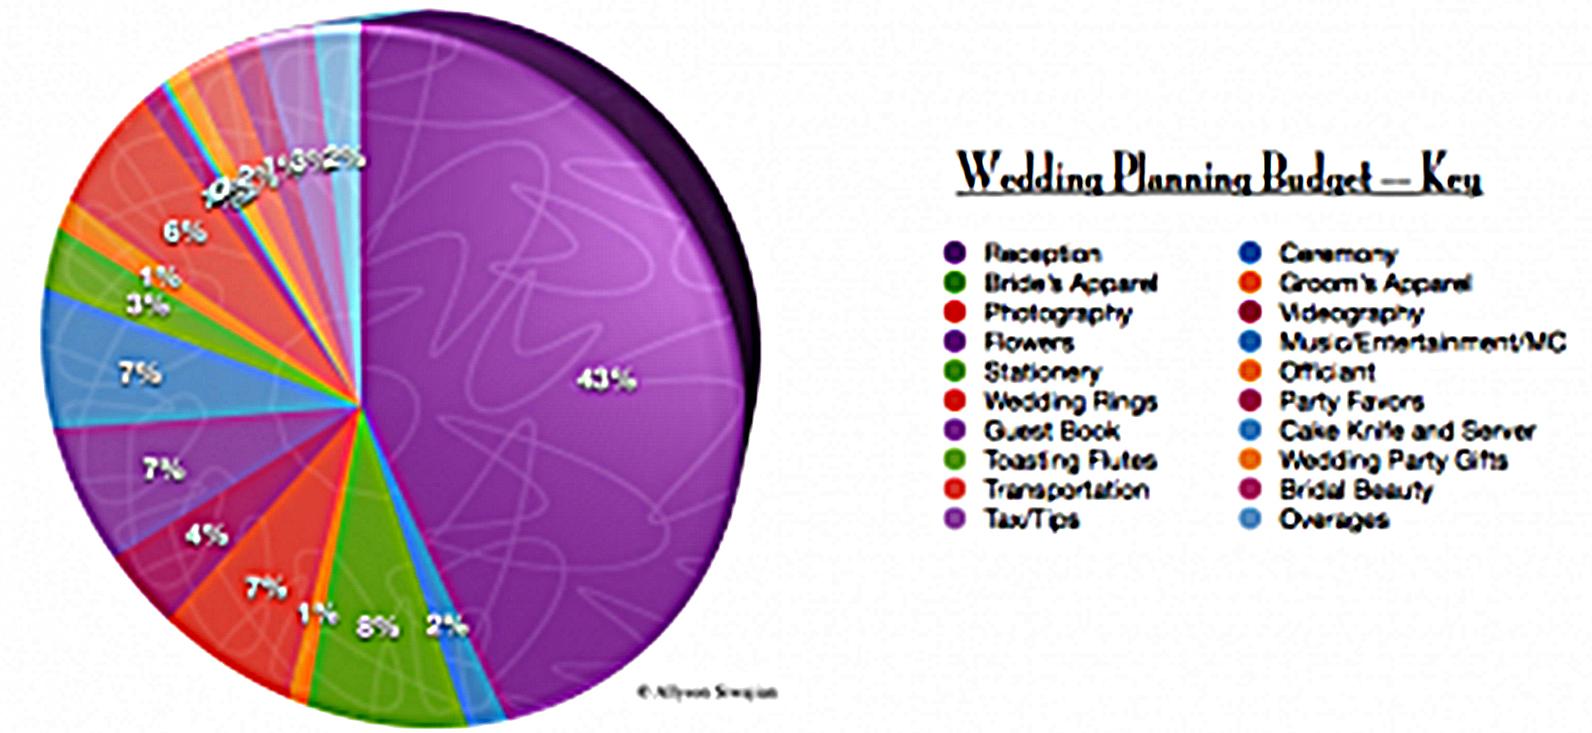 wedding budget estimator screenshot  sample wedding budget